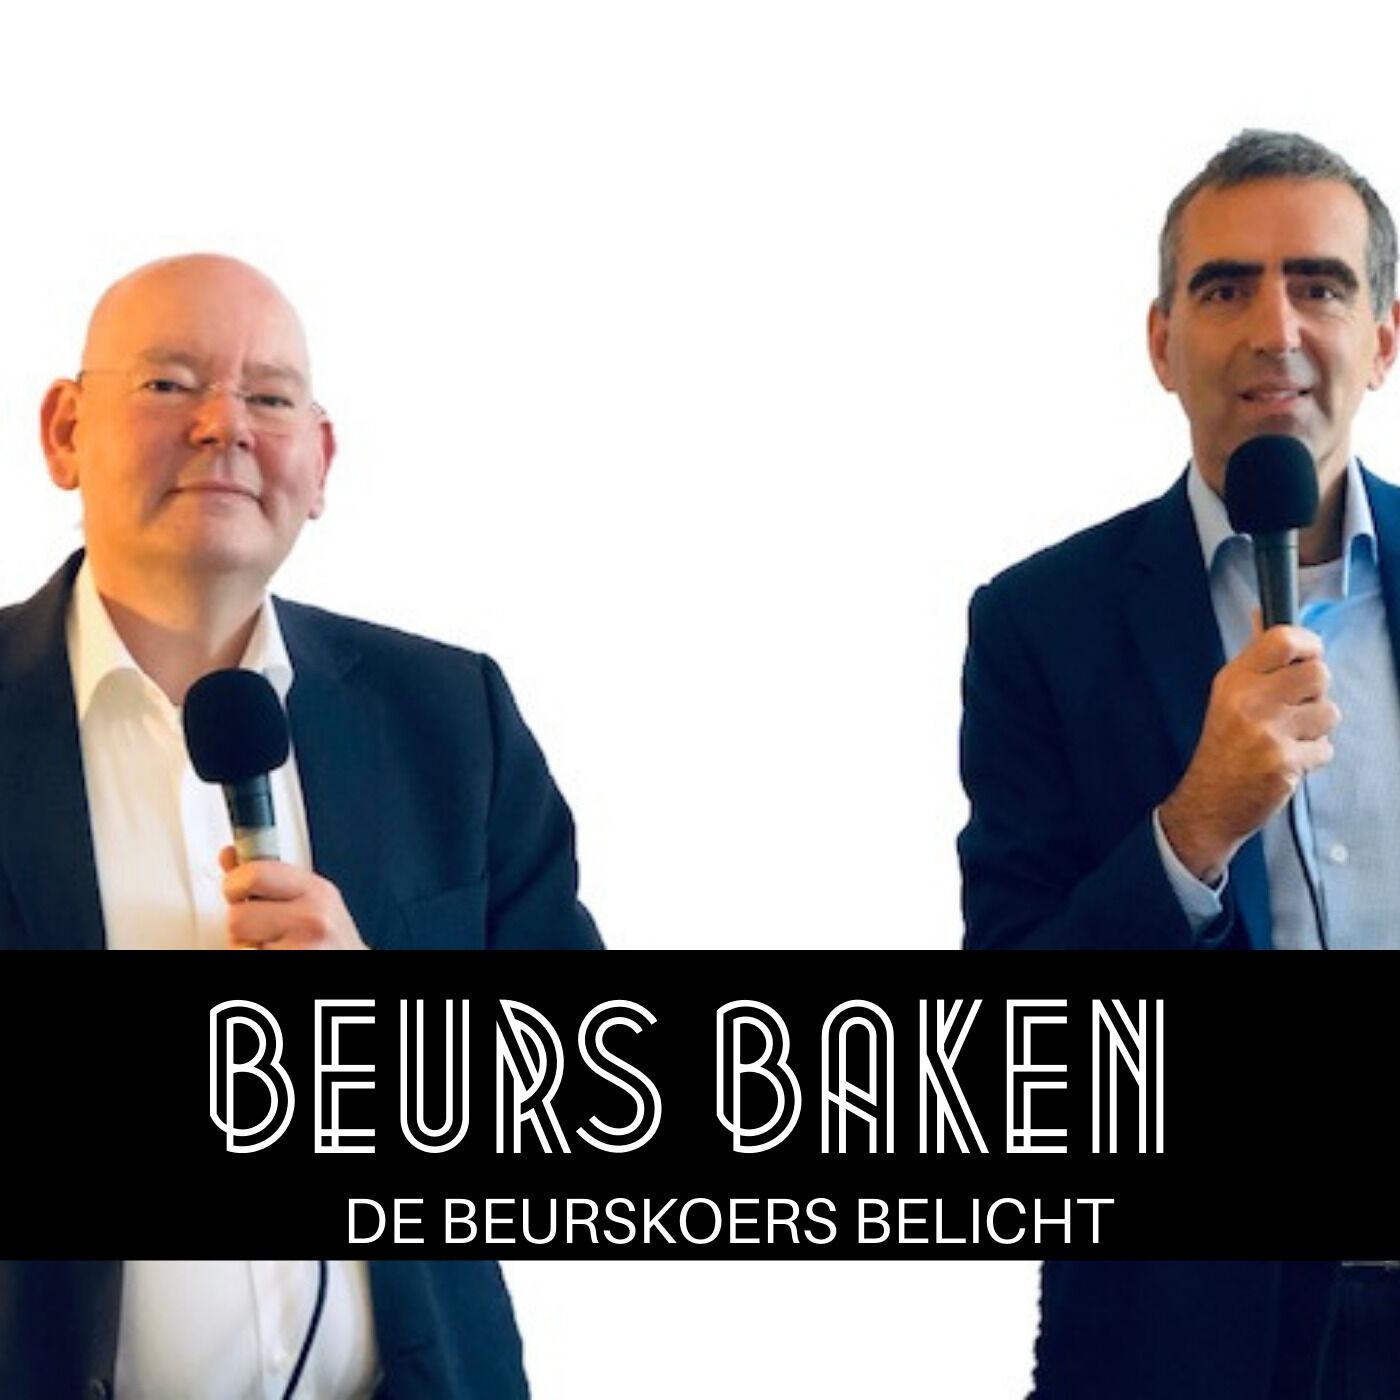 Beurs Baken logo